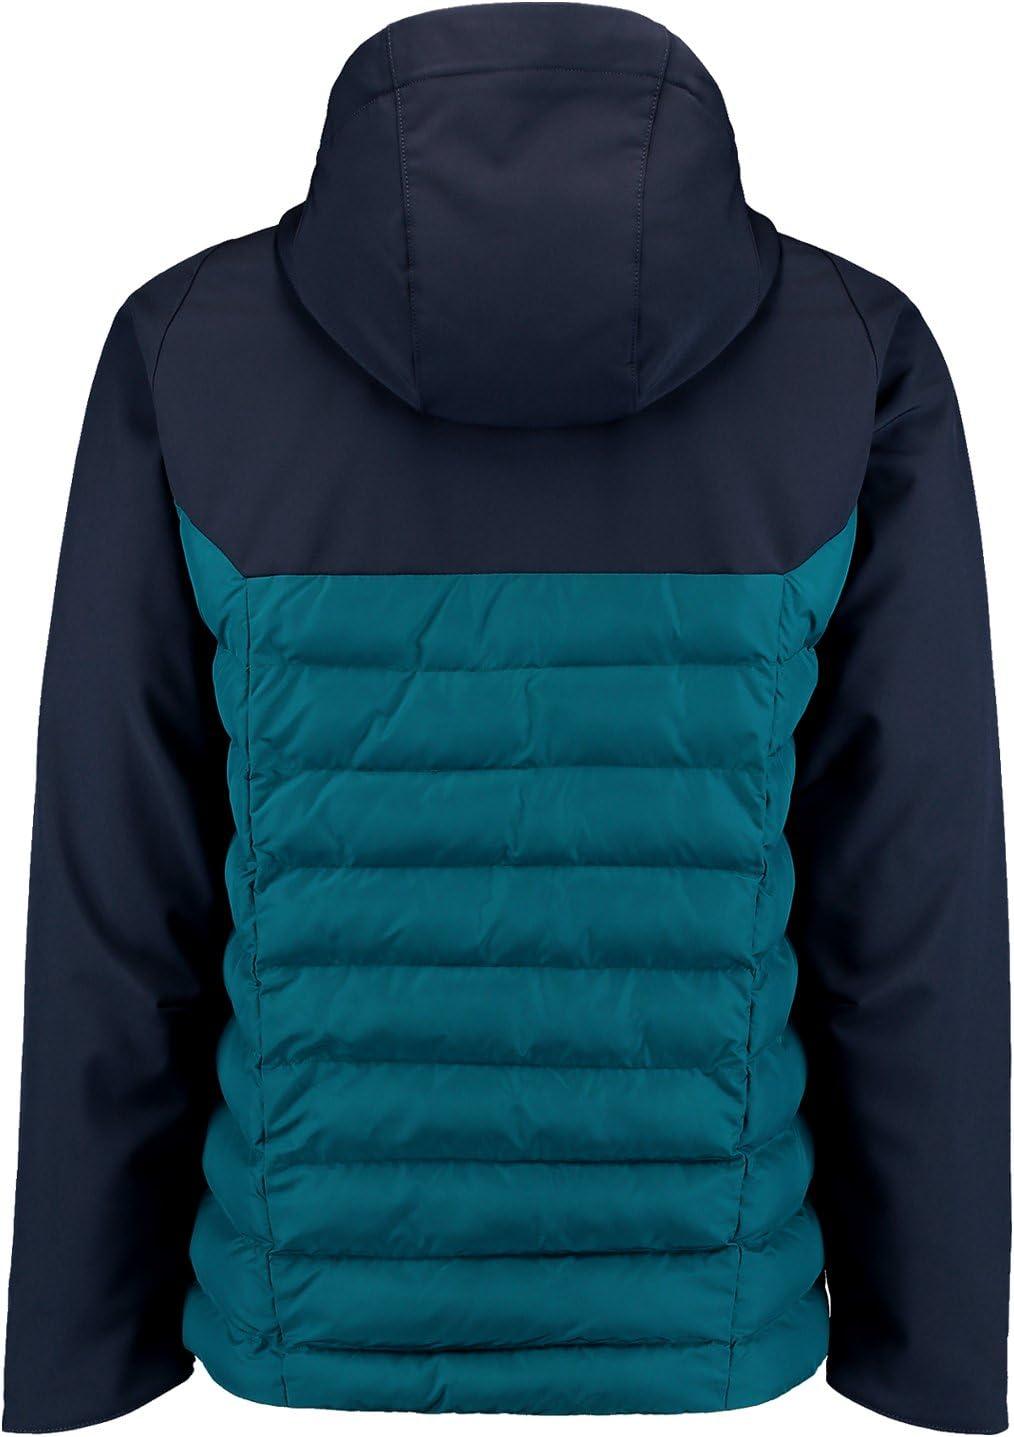 O Neill PM 37-N Jacket Cappotti Giubbotti e Giacche Uomo